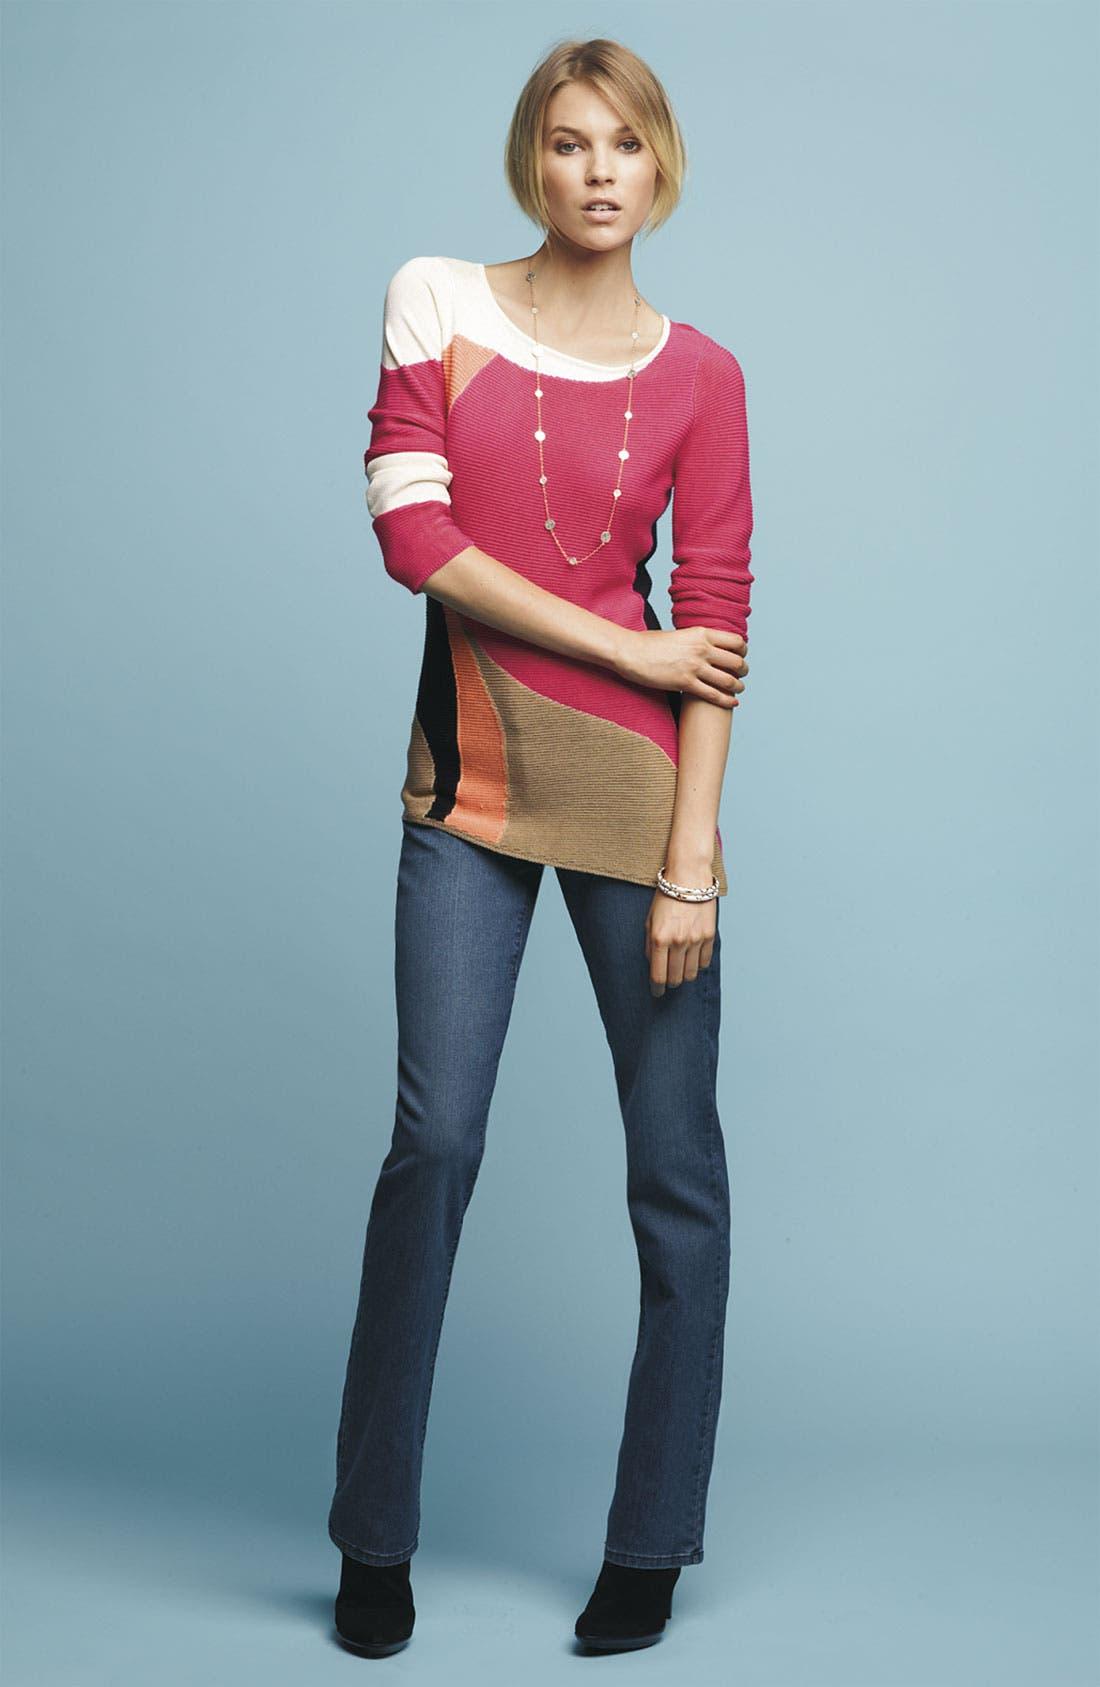 Alternate Image 1 Selected - Nic + Zoe Sweater & NYDJ Skinny Jeans